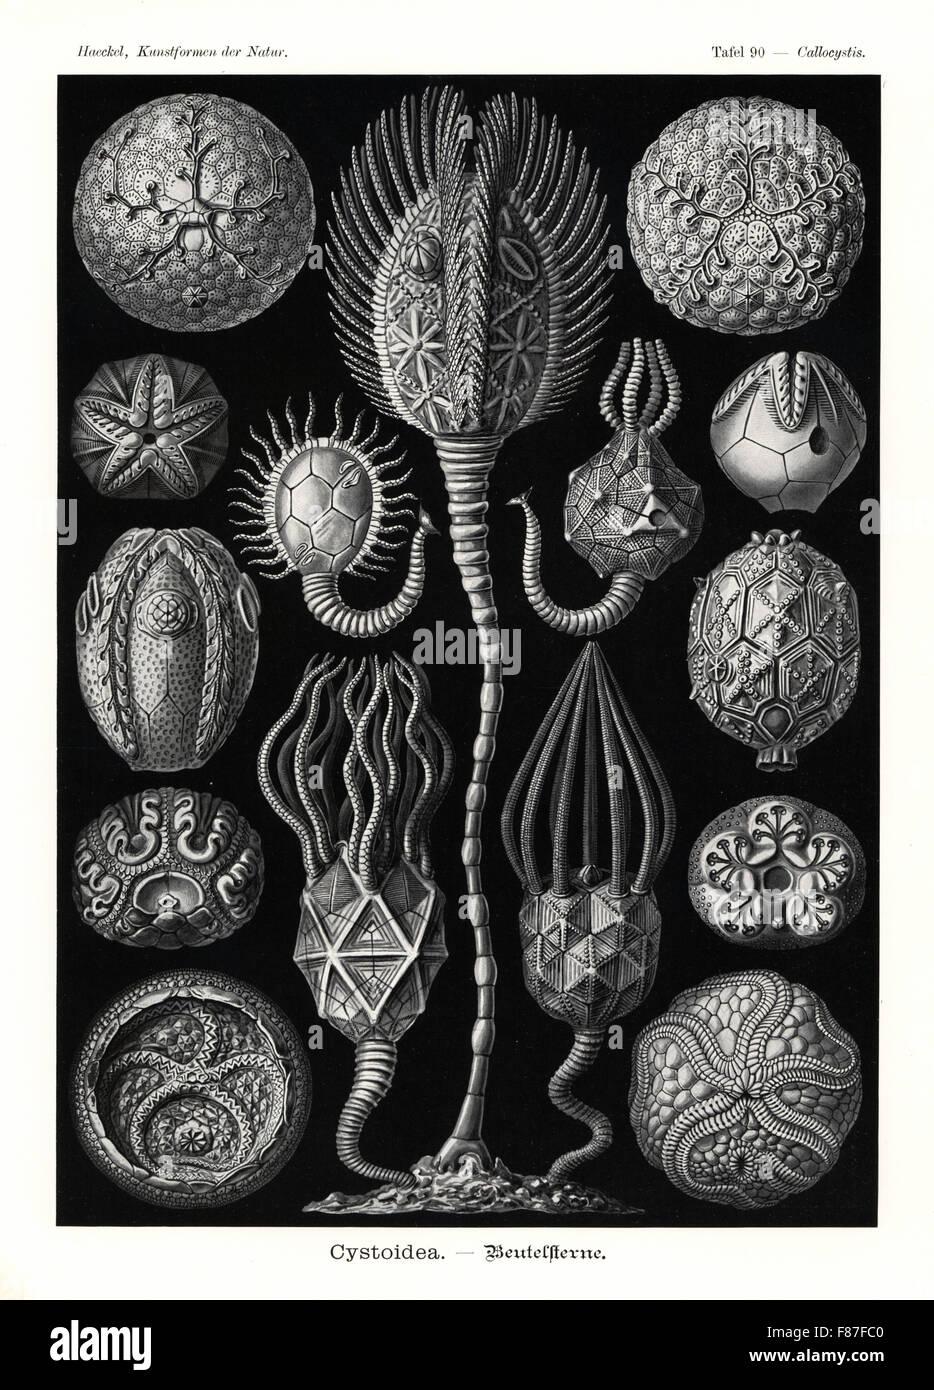 Cystoidea or cystoids, extinct fossil echinoderms: Staurocystis quadrifasciata 1, Glyptosphaerites leuchtenbergi Stock Photo